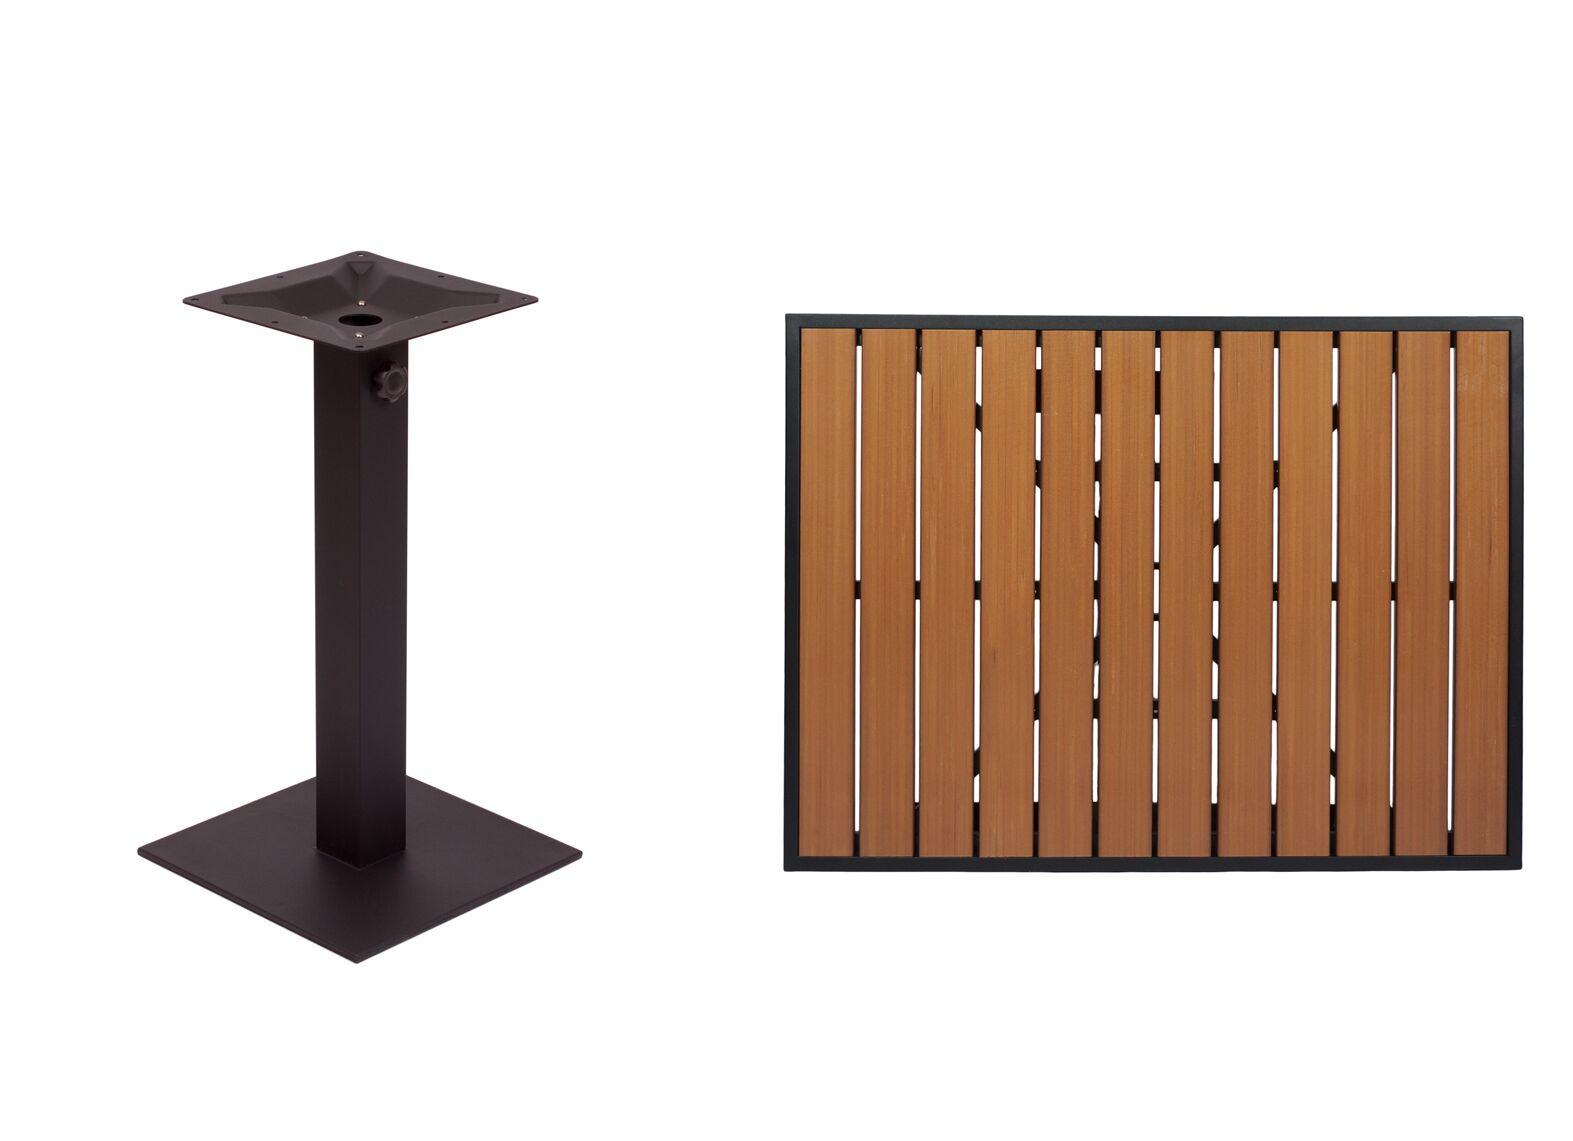 Longport Teak Dining Table Color: Black, Table Height: 42